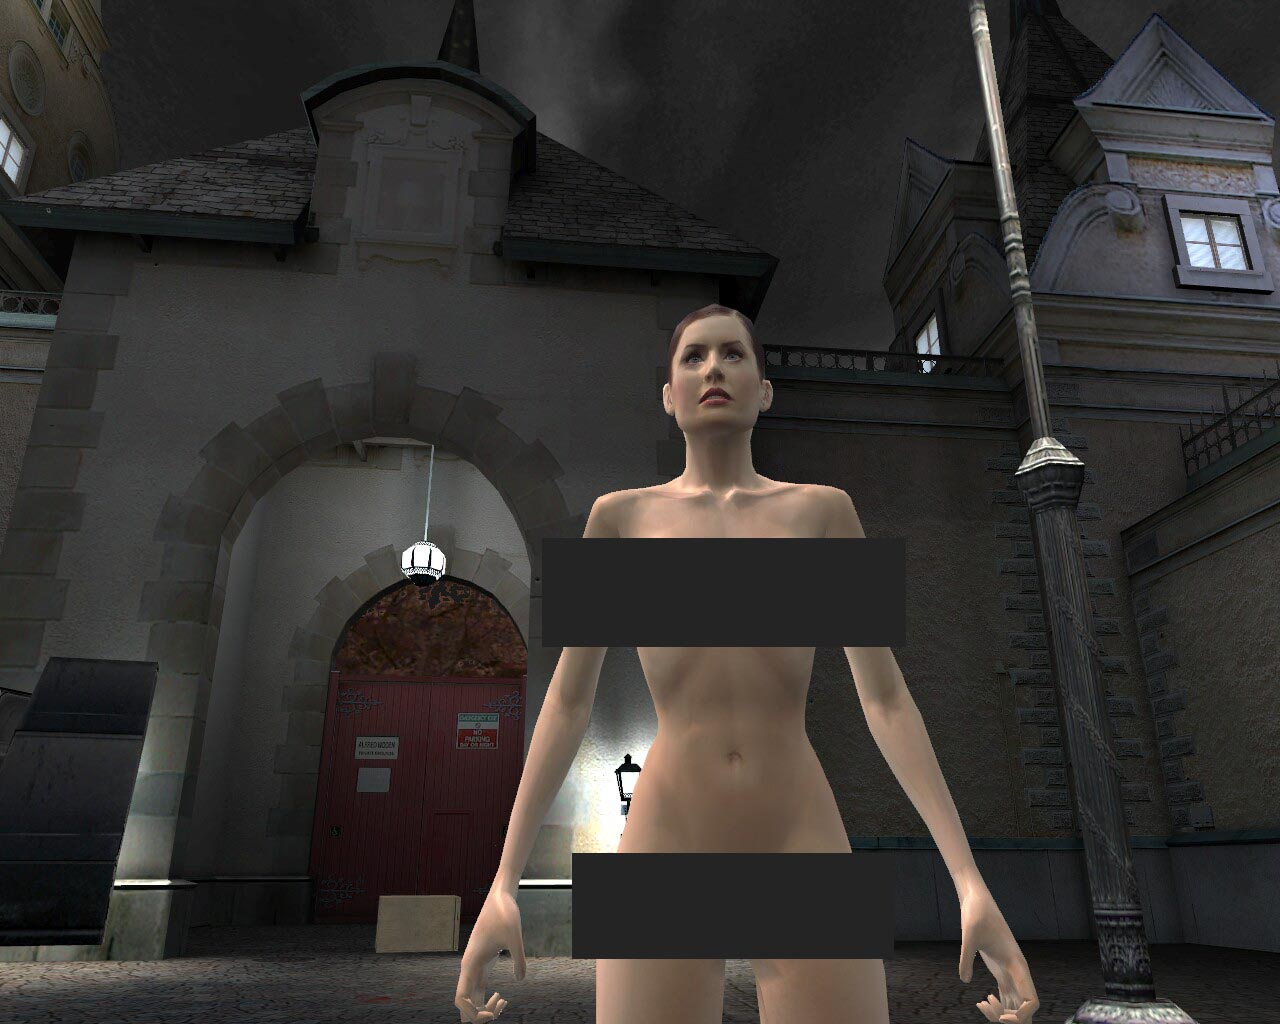 Max payne nude patch porn movie